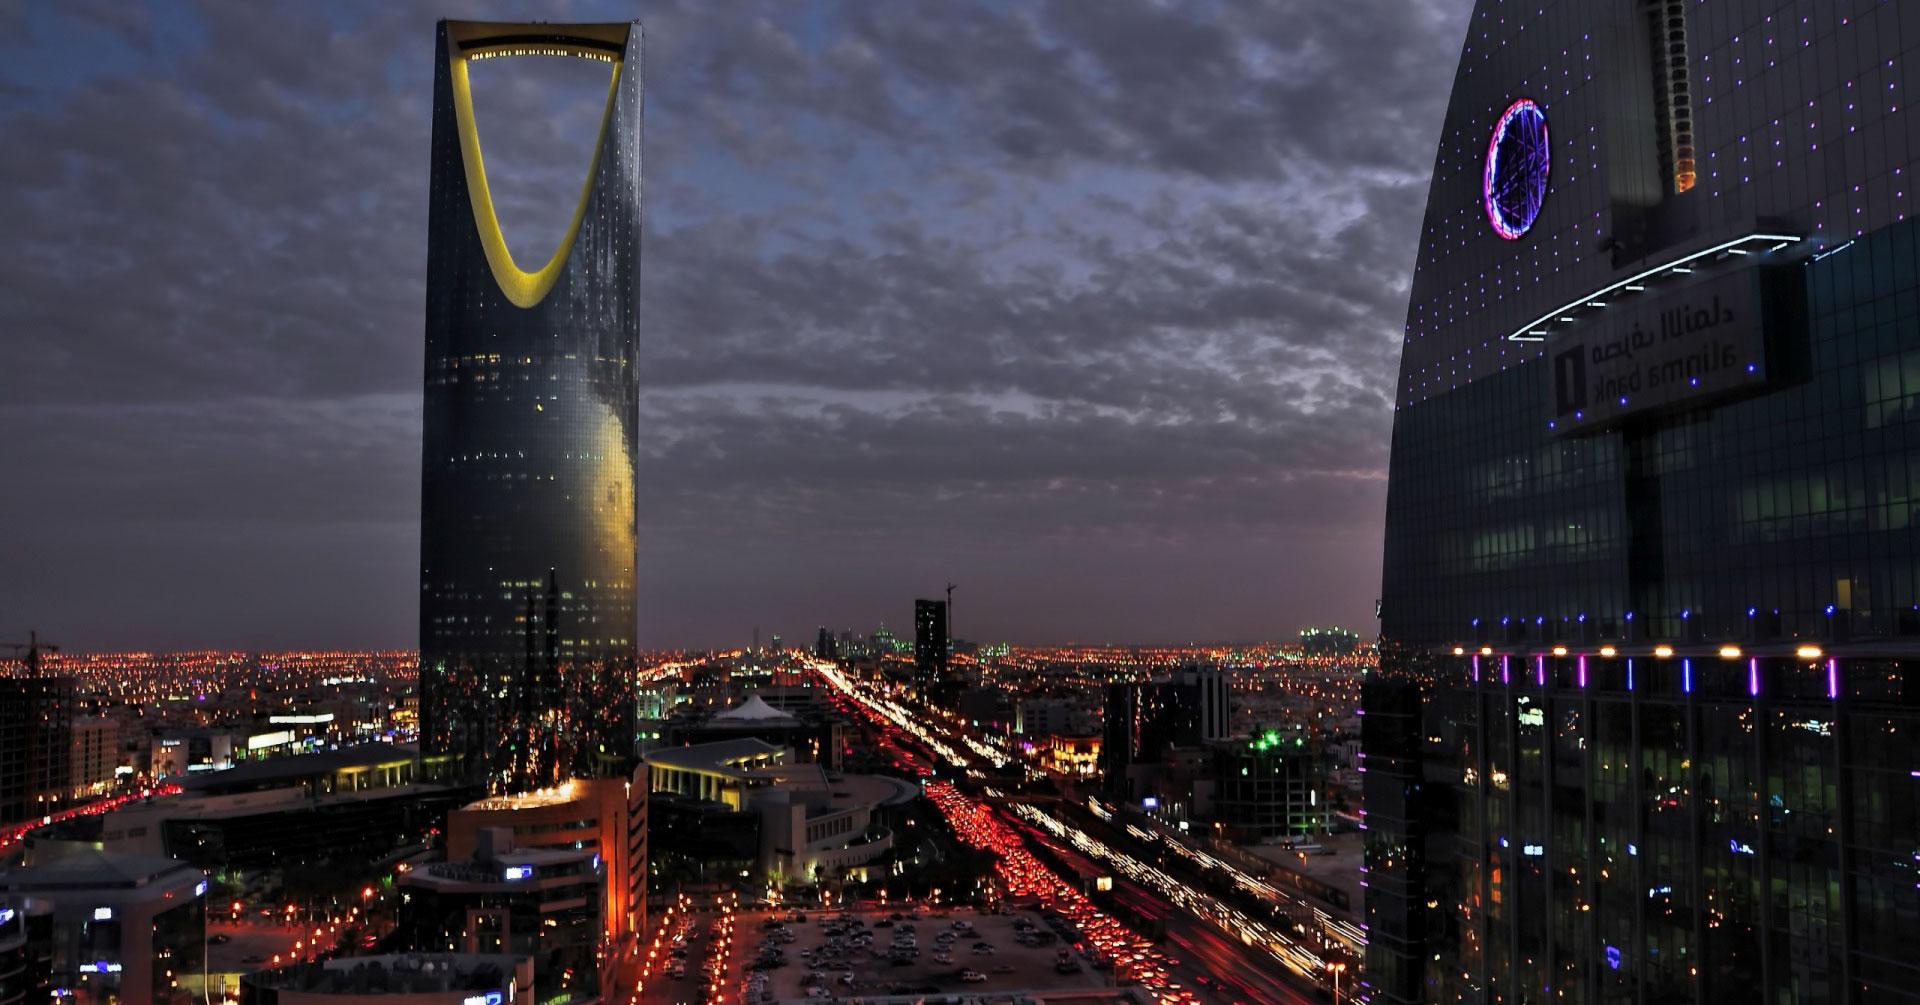 ufeffmapa de arabia saudita ufeff  donde est u00e1  queda  pa u00eds